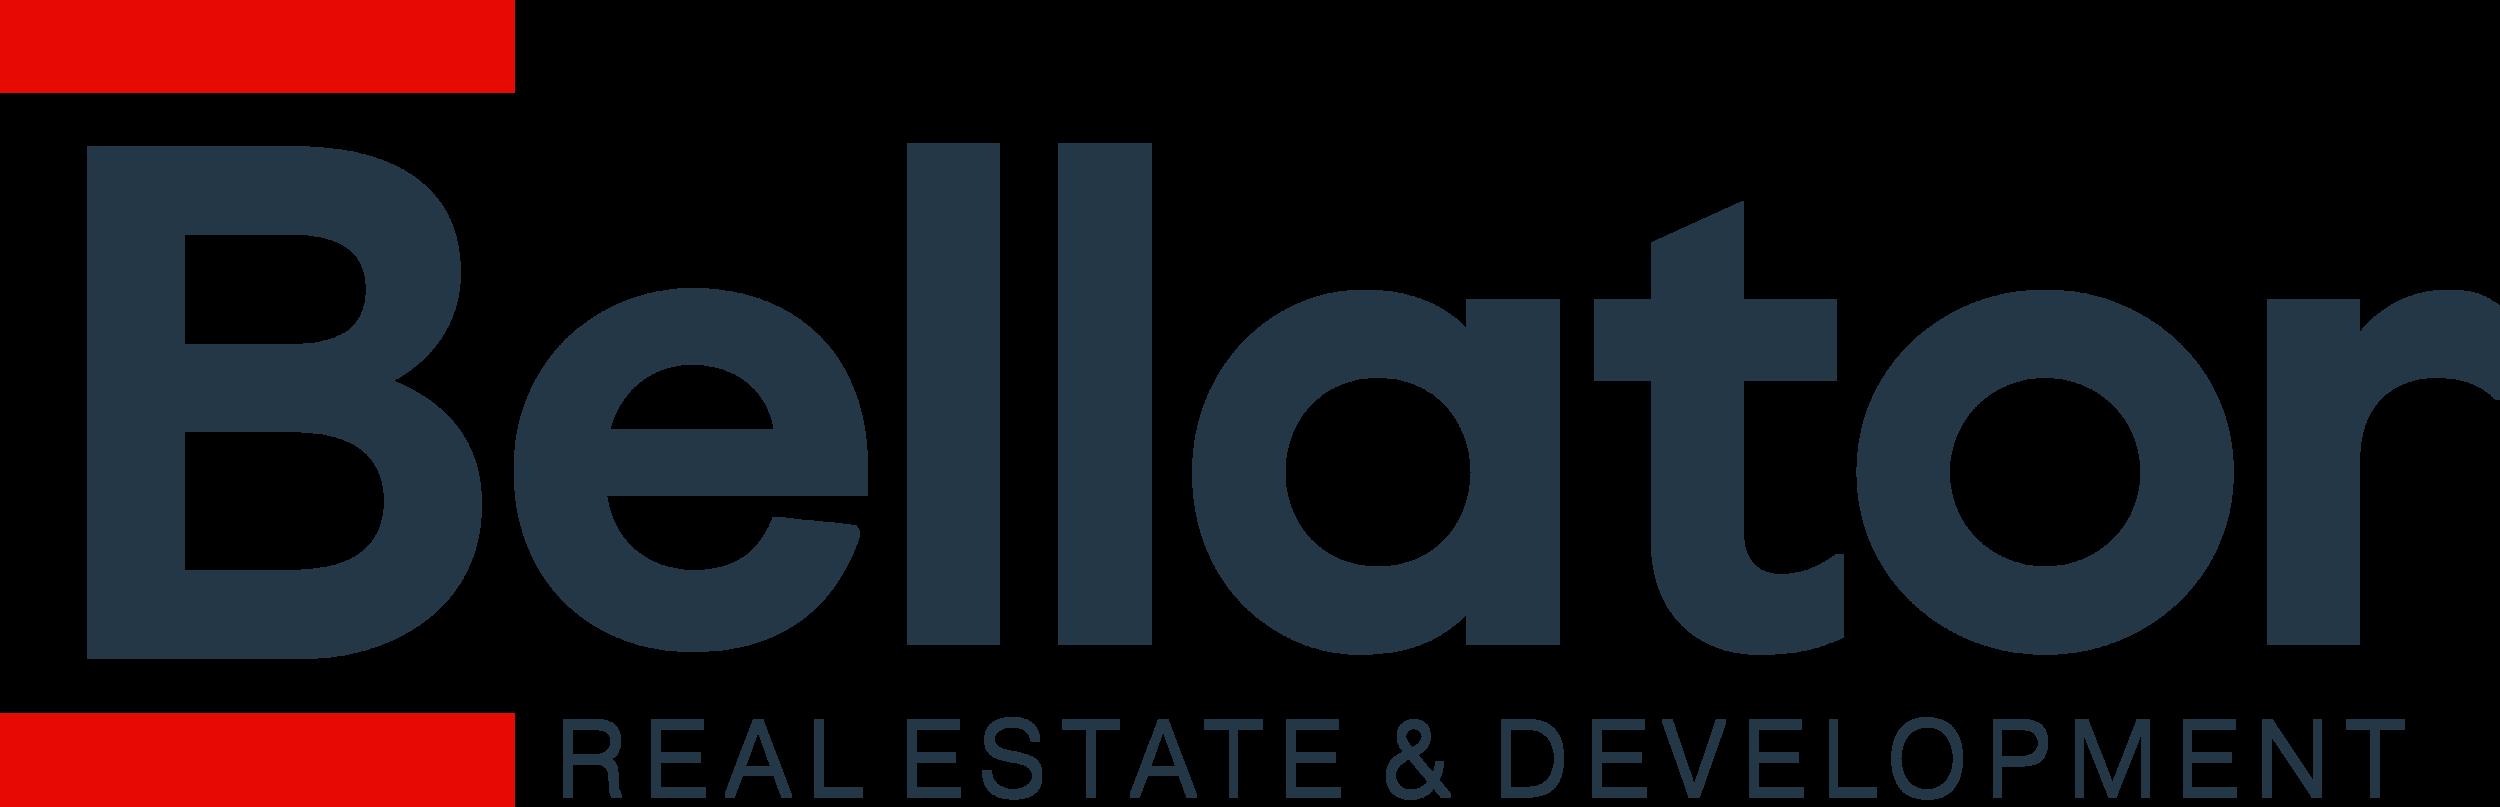 bellator_official-logo_Primary Logo.png